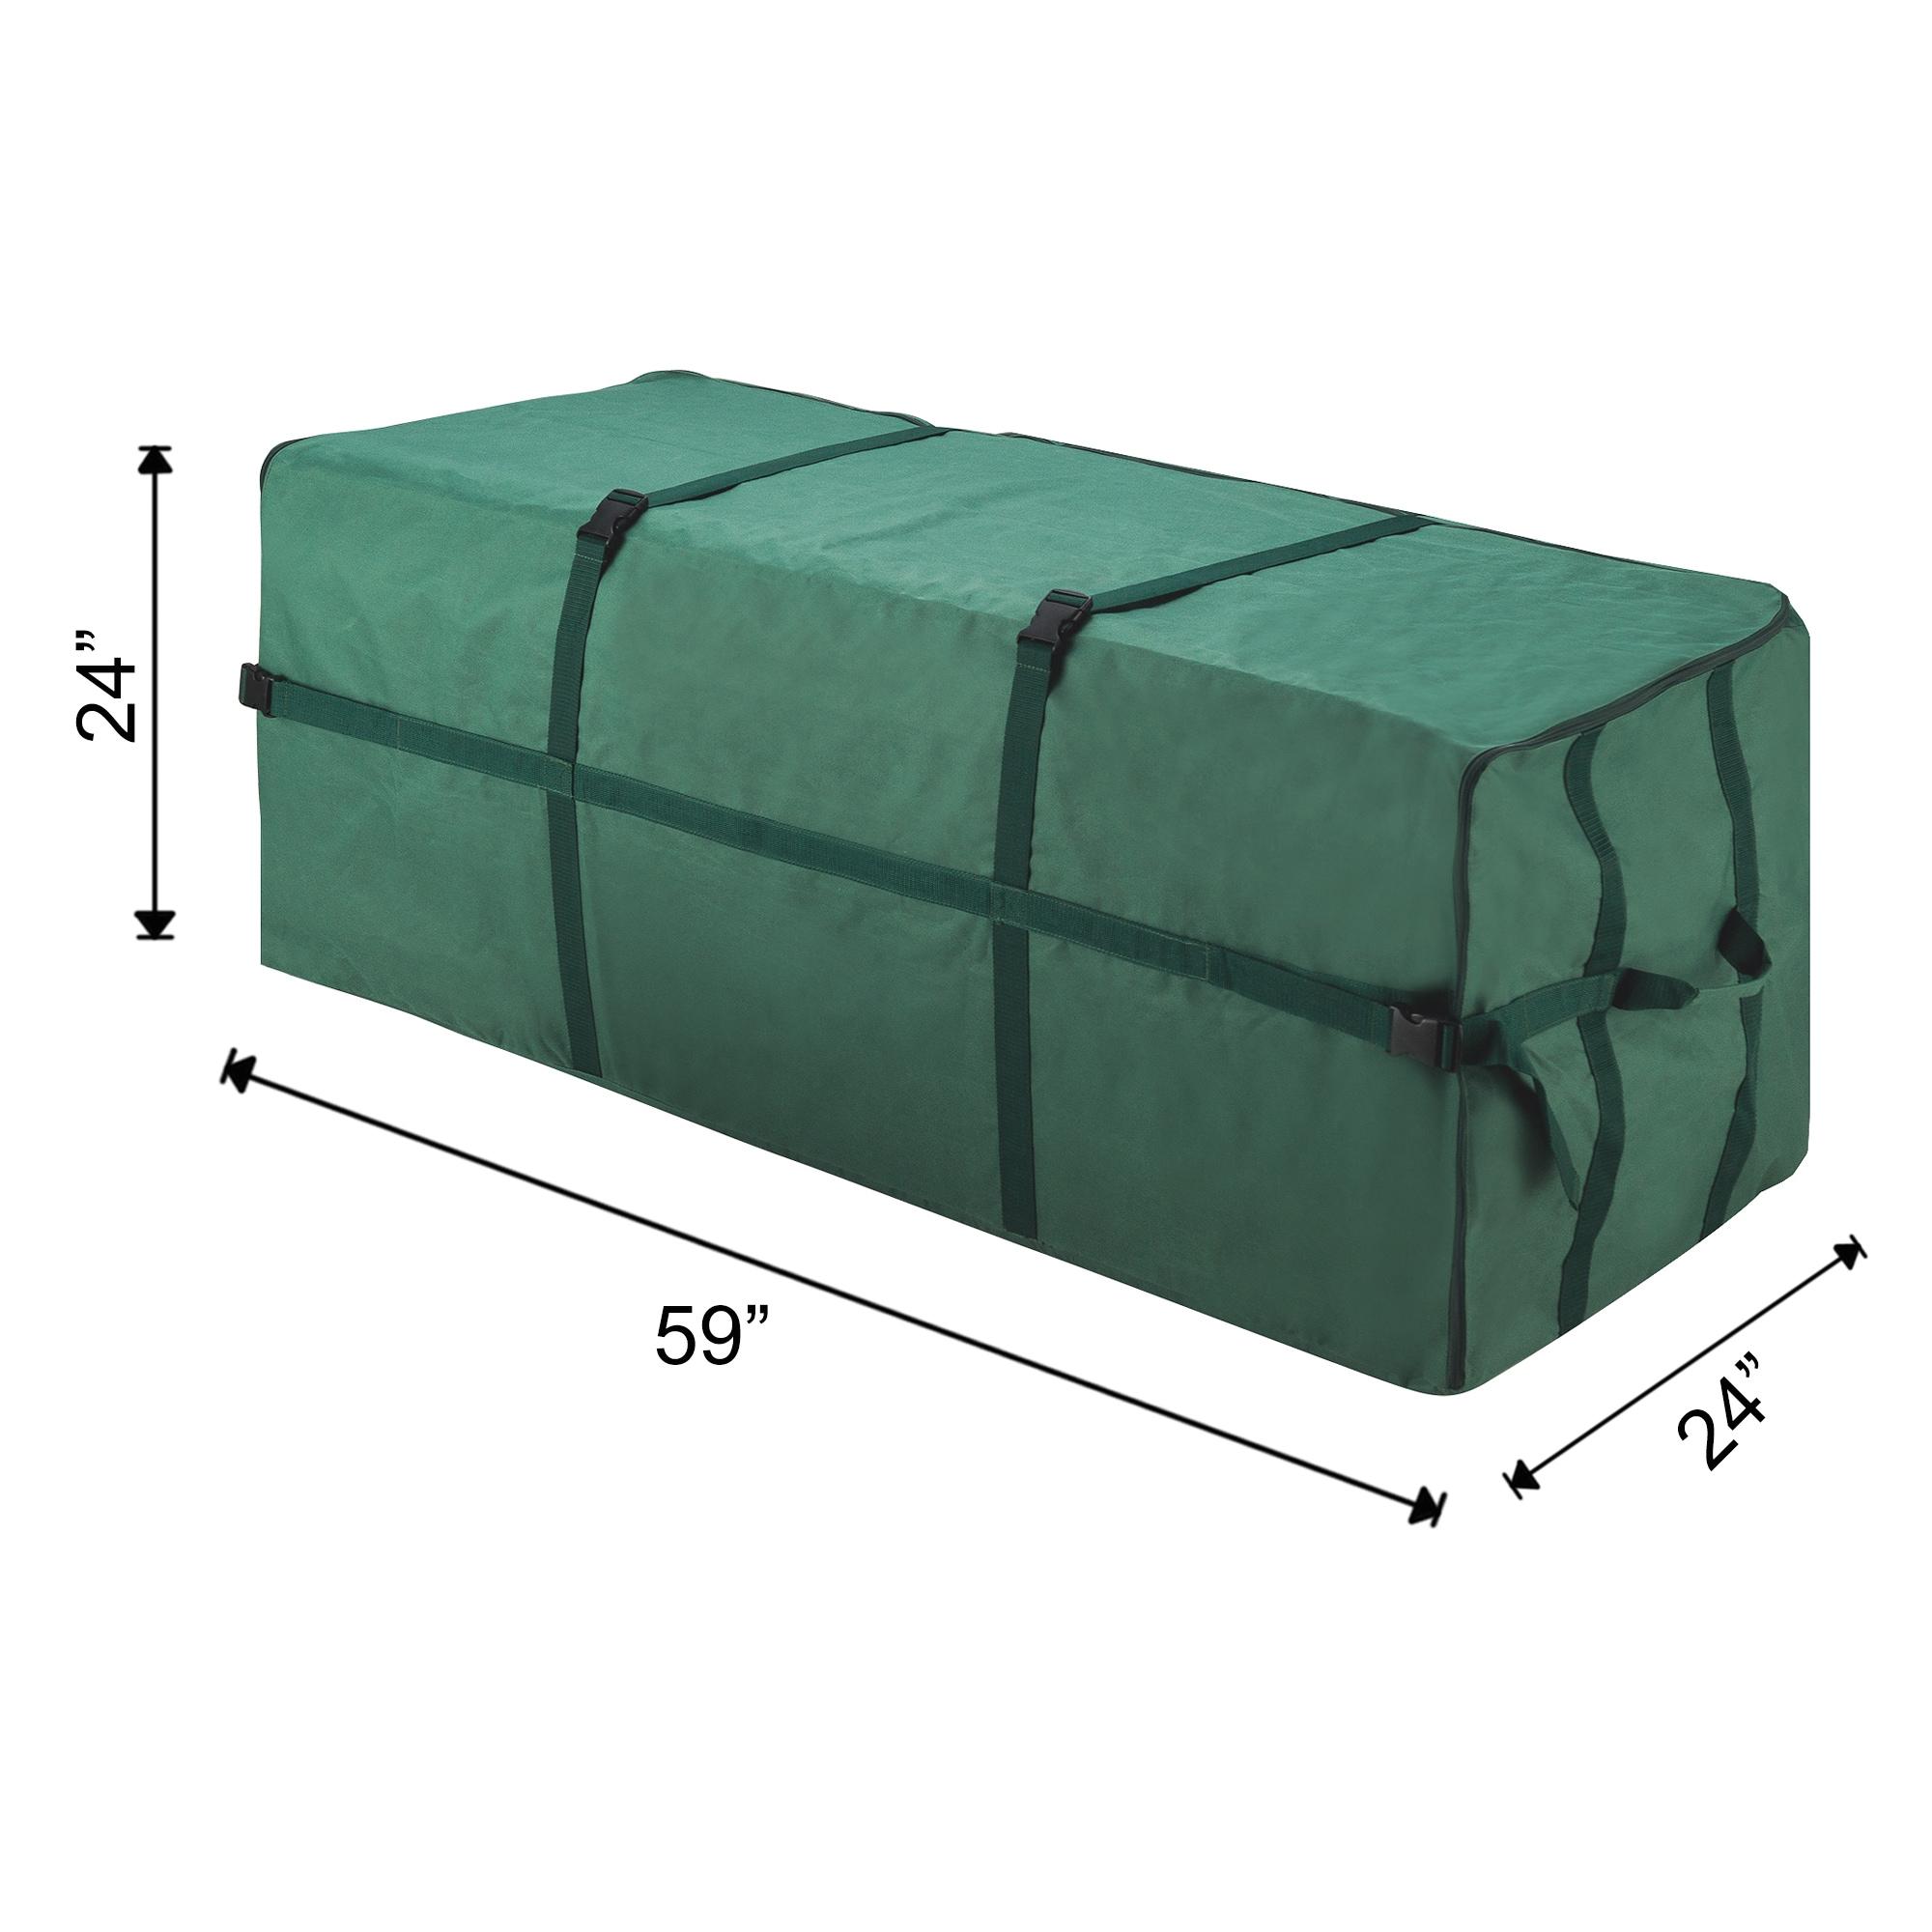 Elf Stor Heavy duty Canvas Christmas Tree Storage Bag for 9